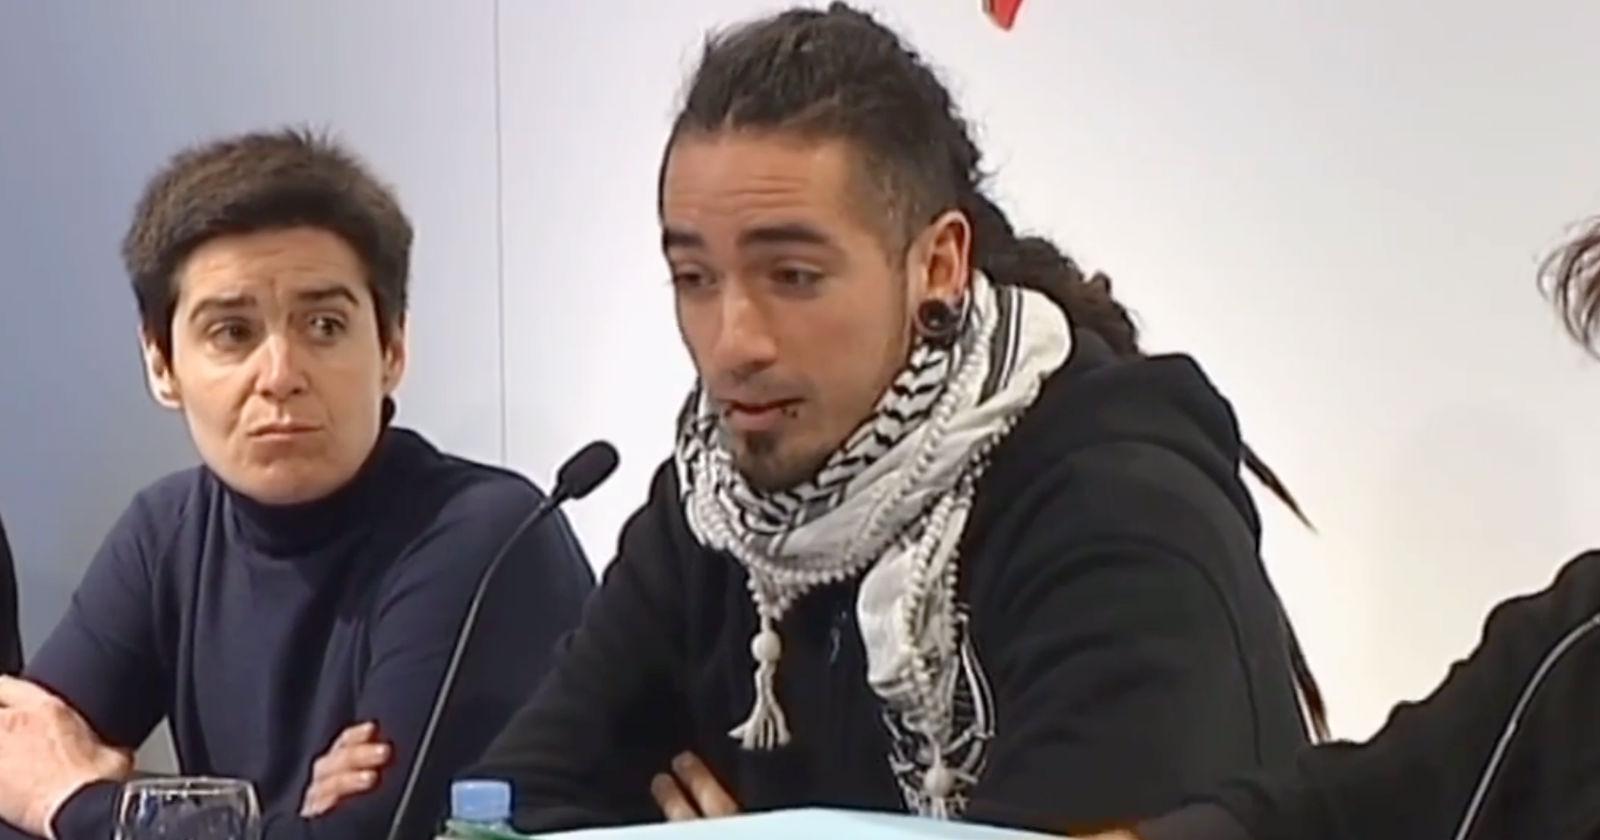 Anarquista chileno Rodrigo Lanza condenado a 20 años por asesinato